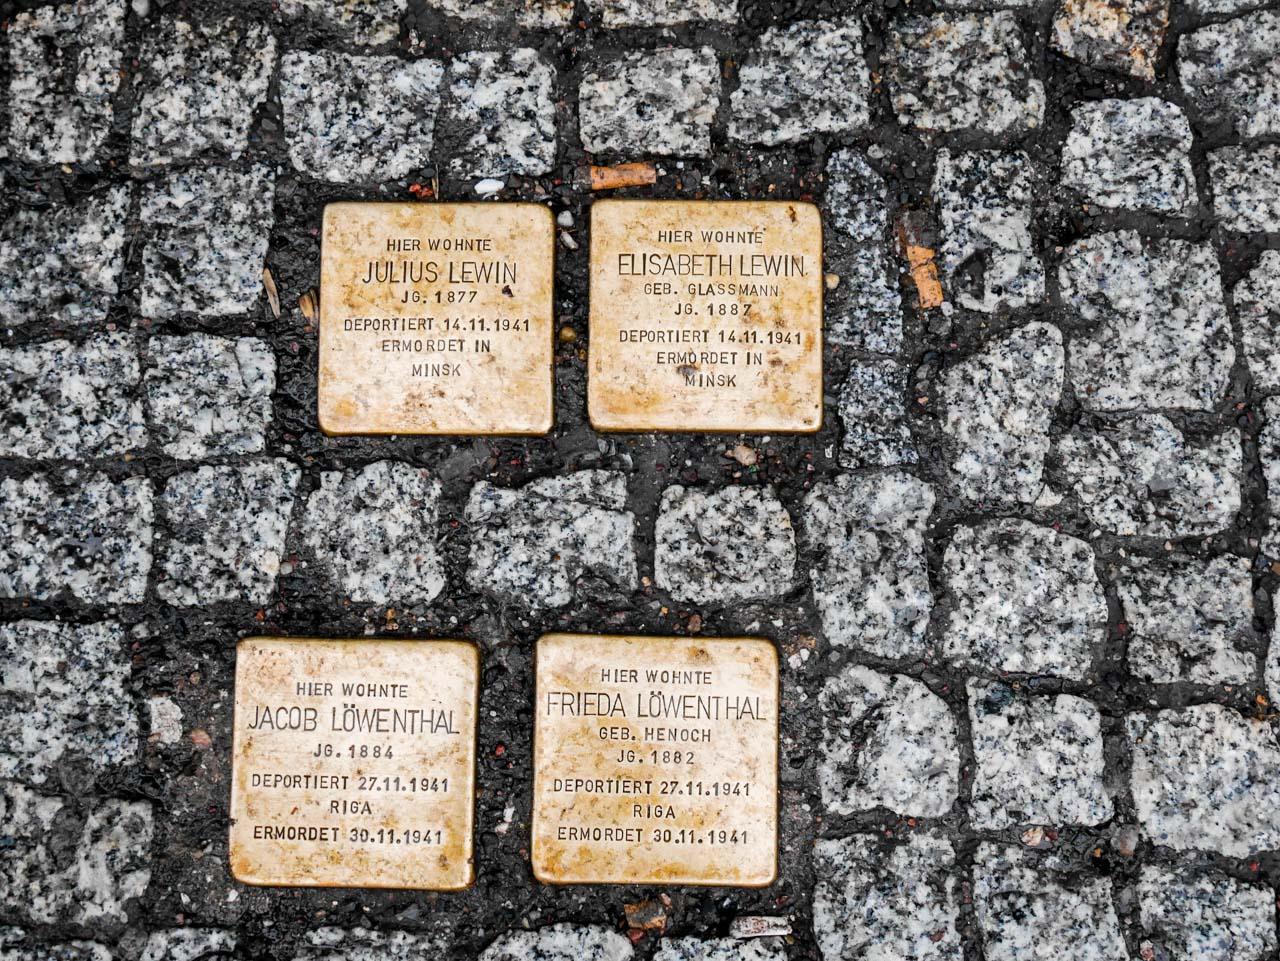 Les trottoirs de Karl Marx Strasse